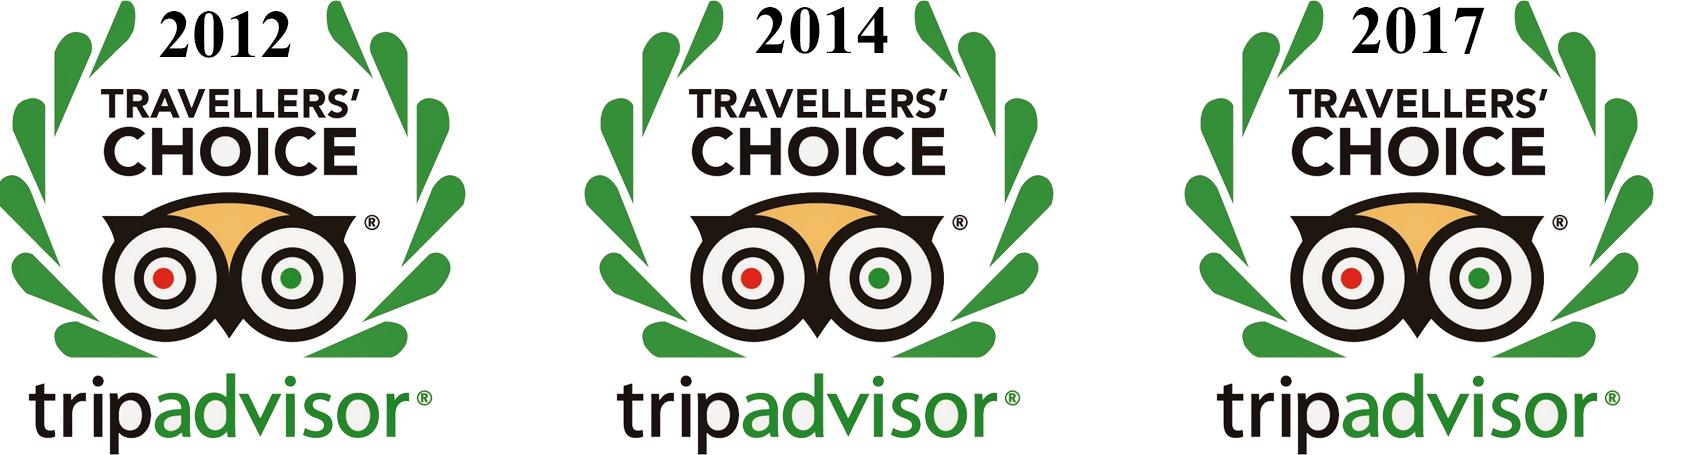 The LimeTree Hotel TripAdvisor Awards